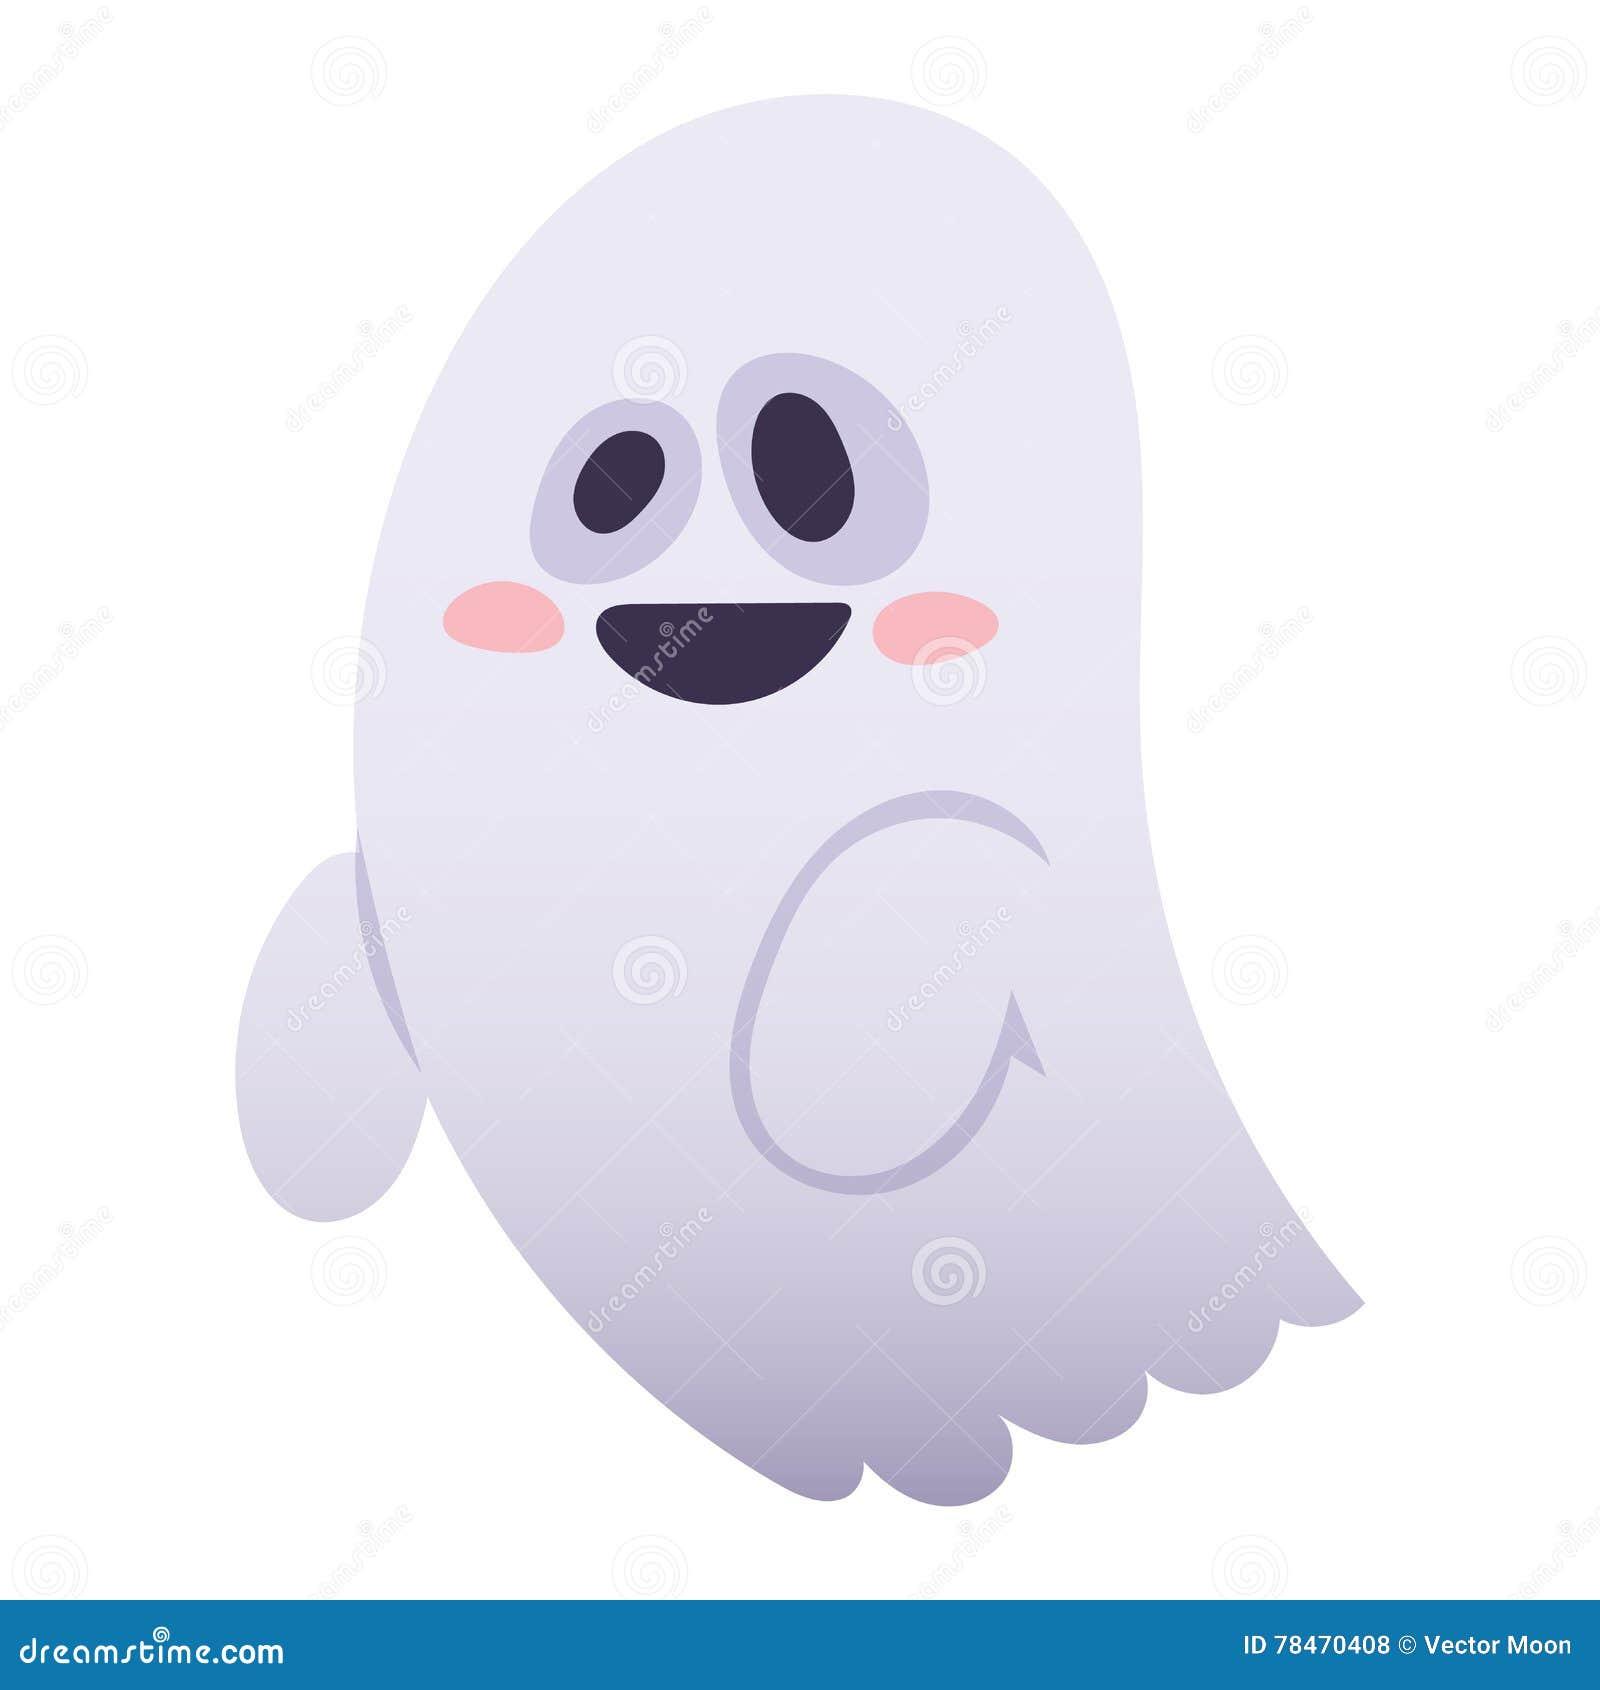 evil cartoon ghost - 450×450